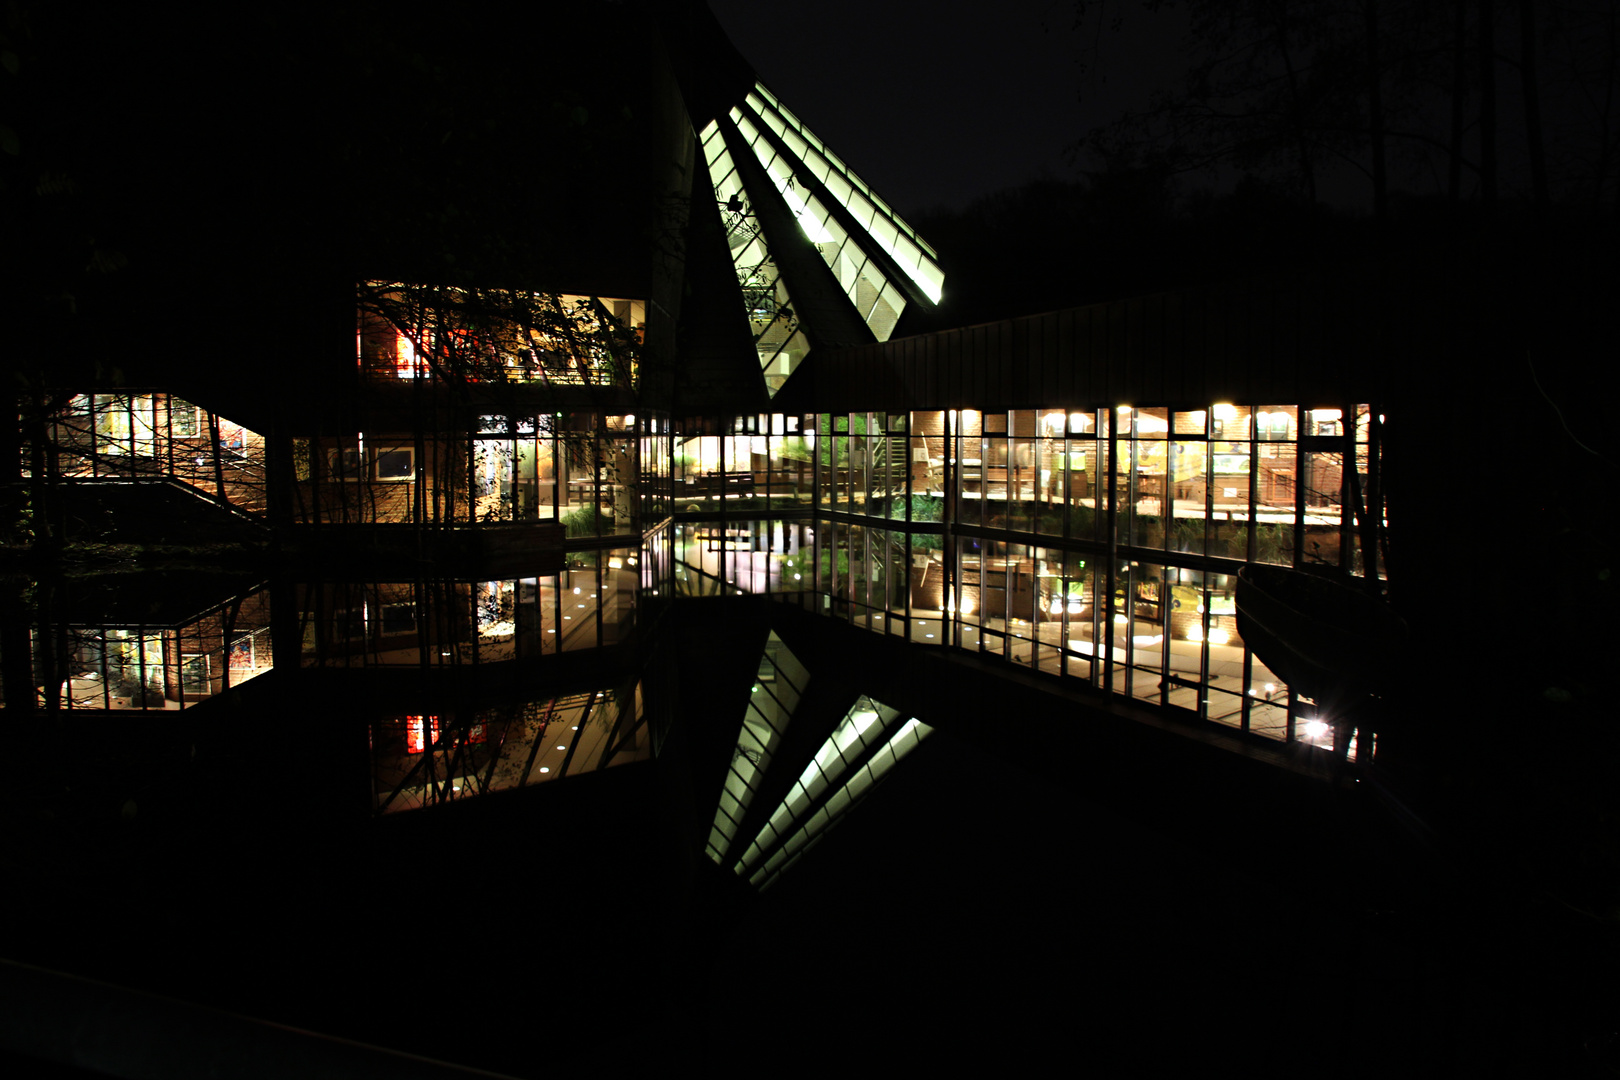 Naturkundemuseum bei Nacht